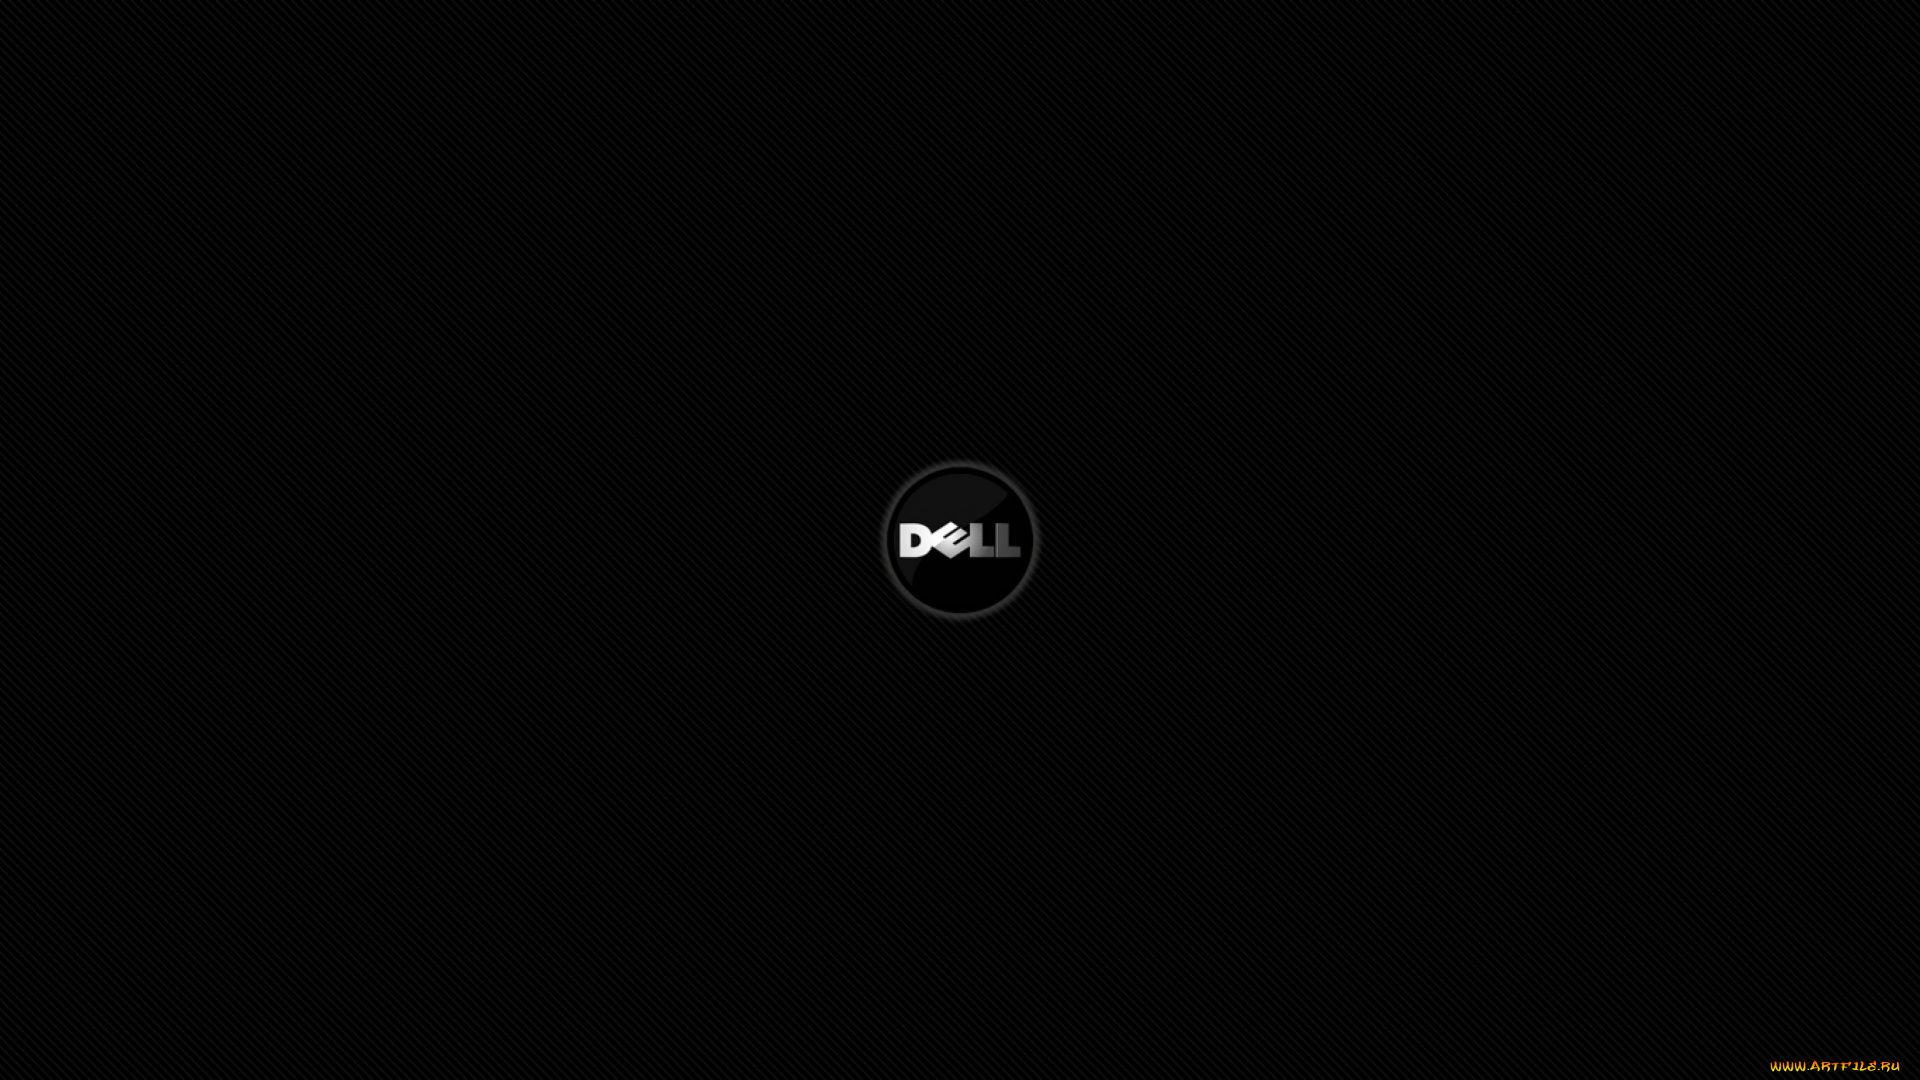 Dell desktop background hd